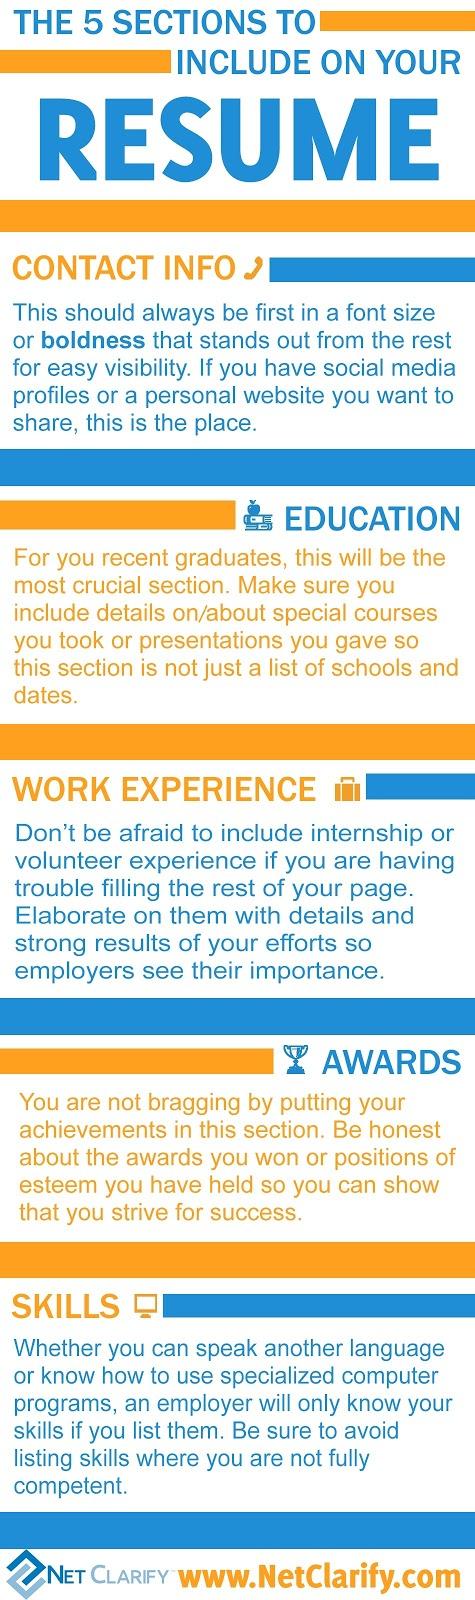 Make proper resume - TRUE-ENJOYTK